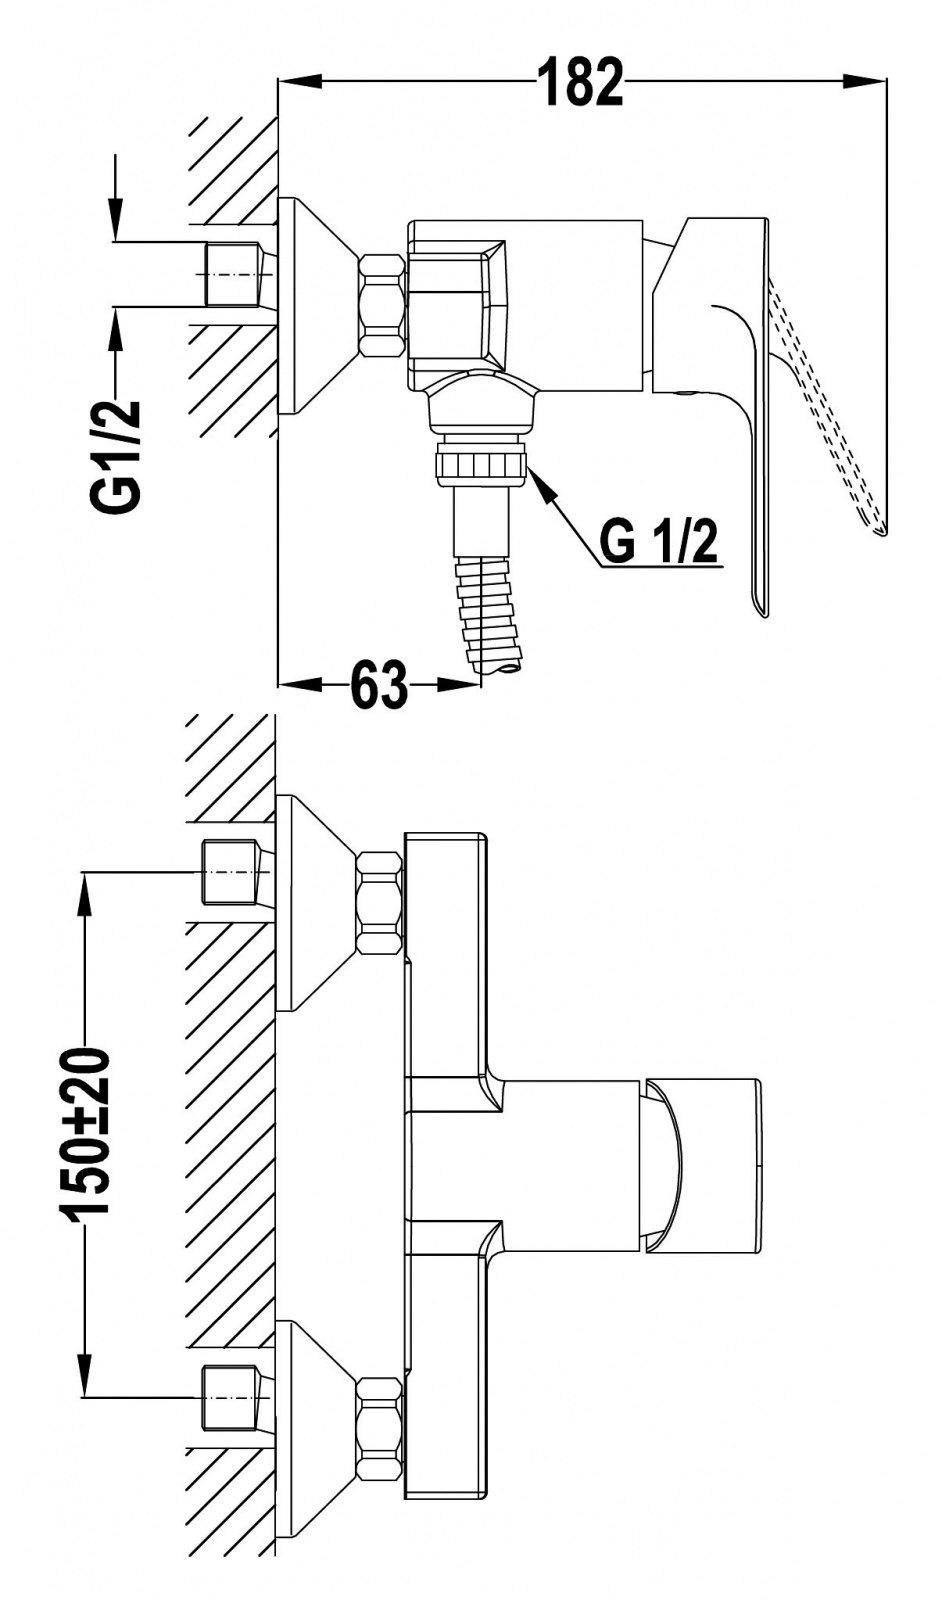 teka duscharmatur armatur duschbatterie aufputz armatur. Black Bedroom Furniture Sets. Home Design Ideas